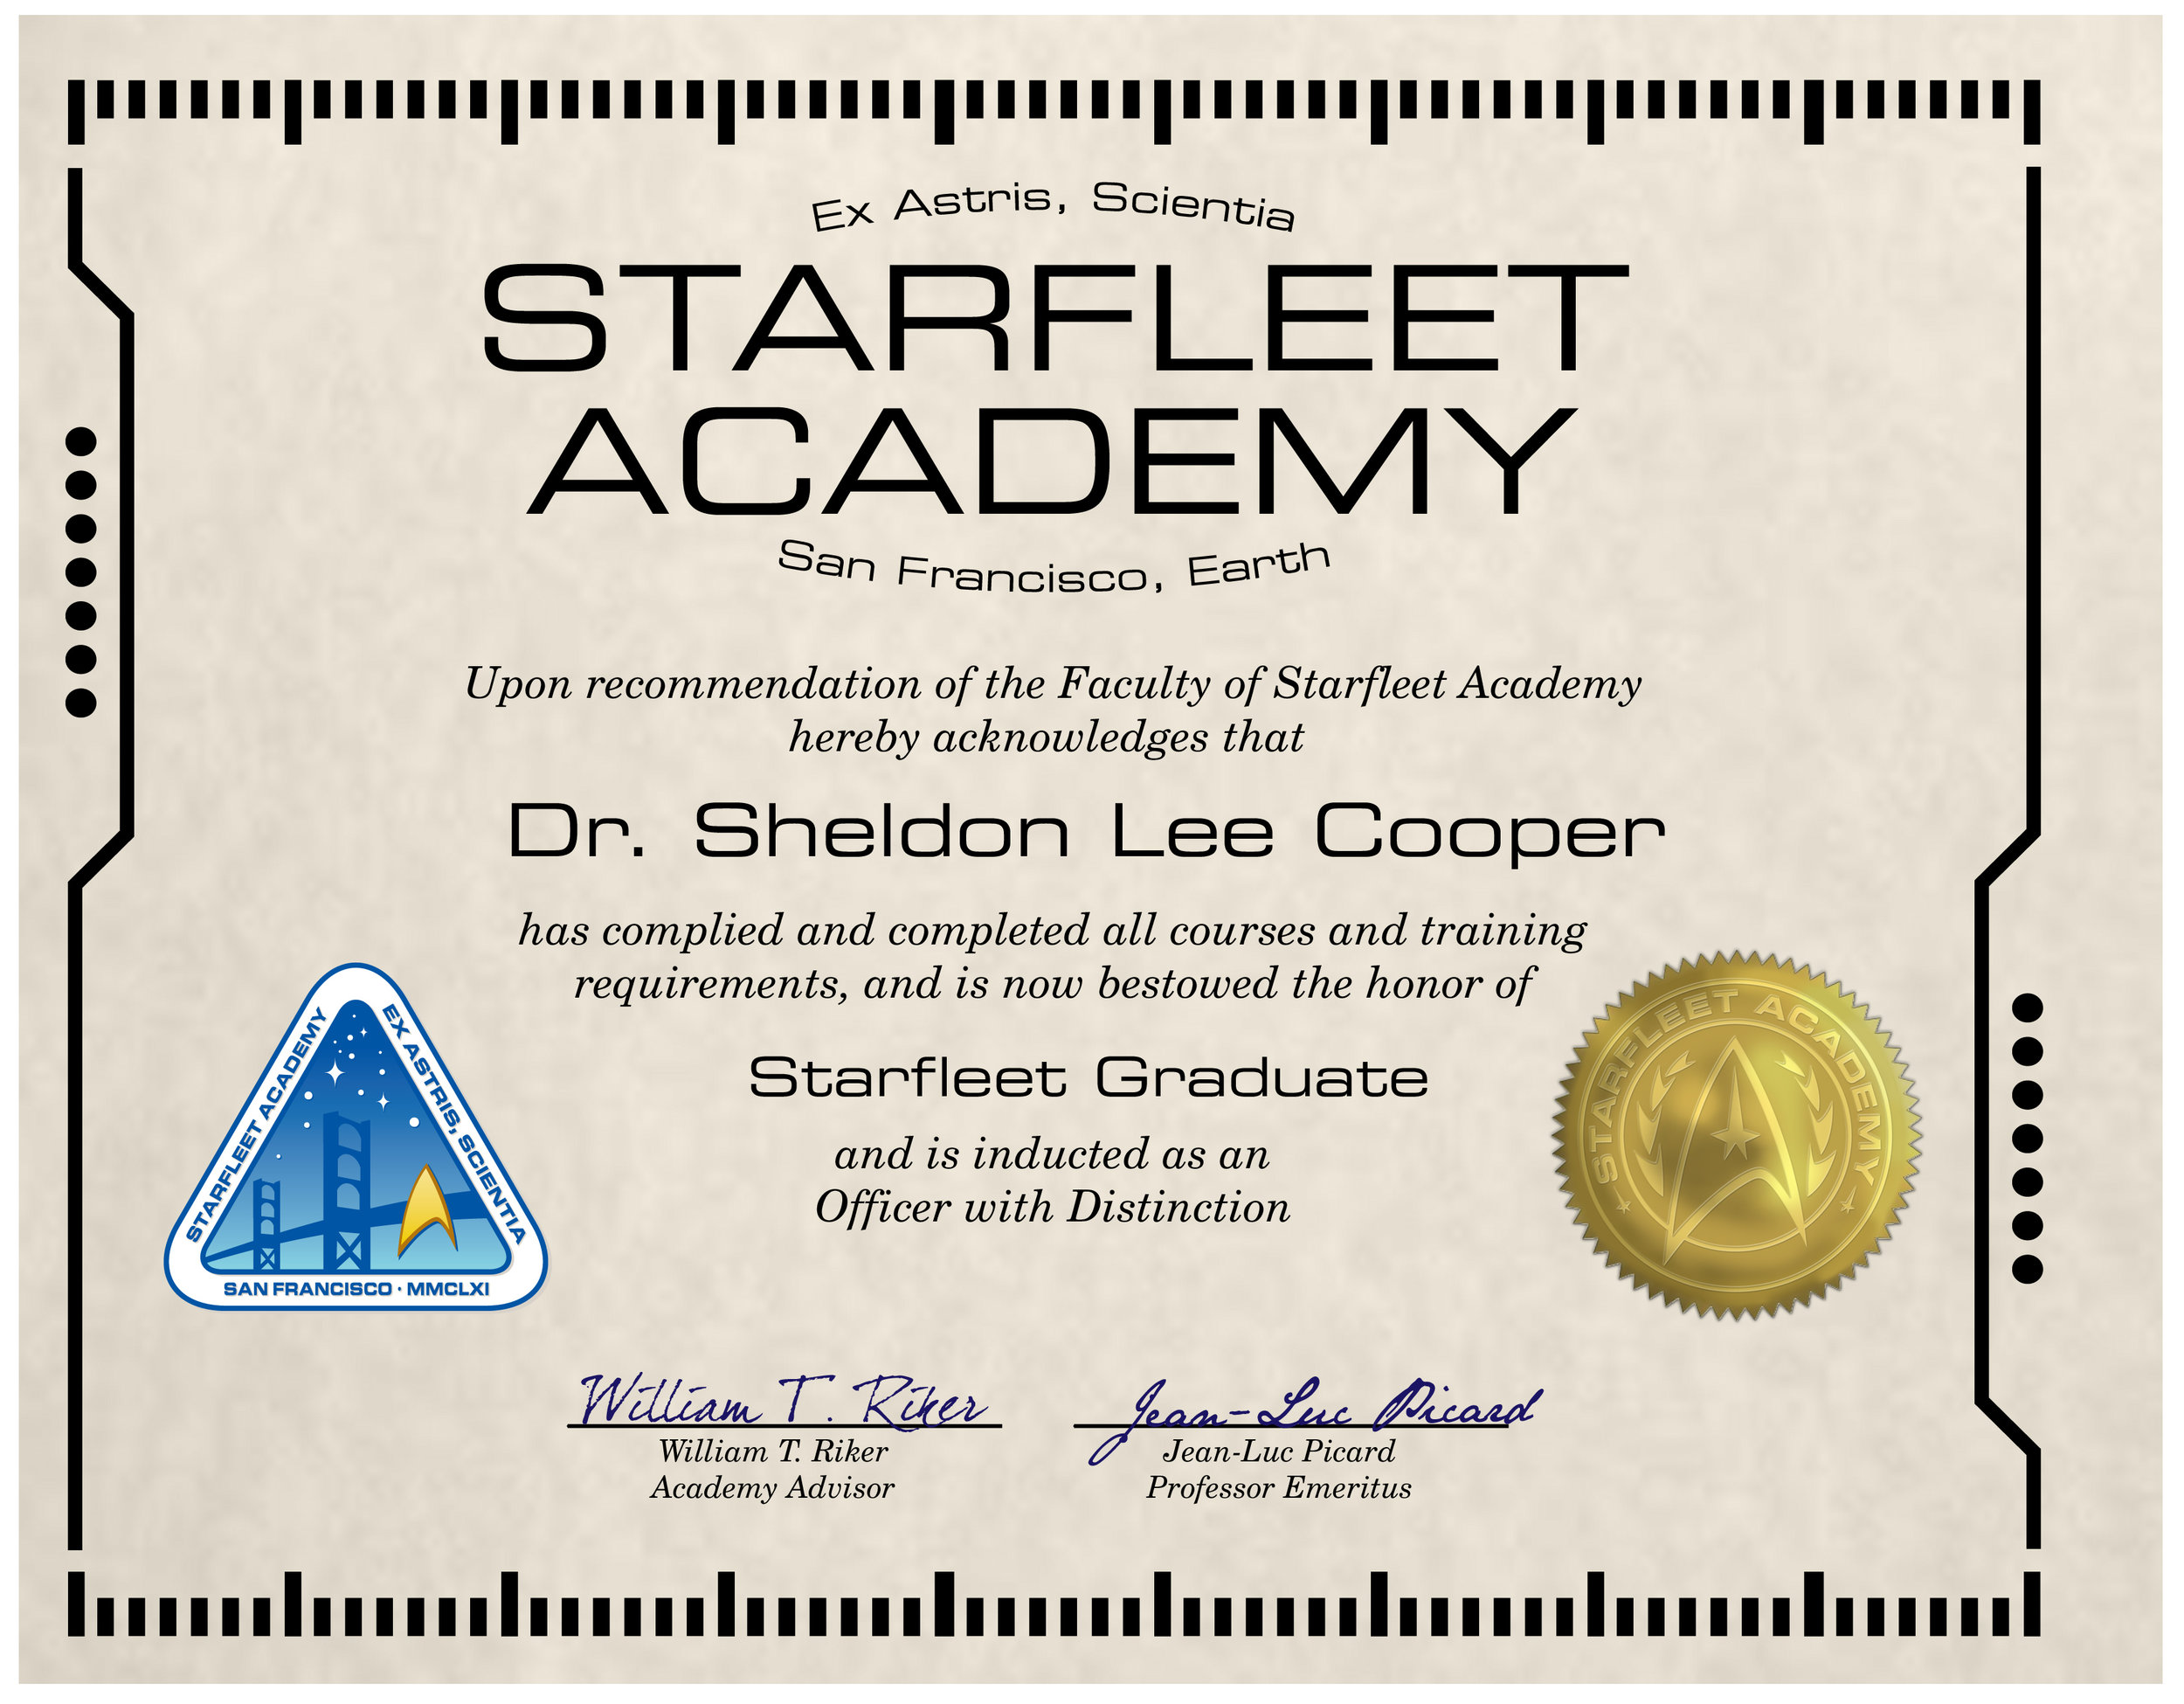 starfleet-academy-diploma-04.jpg